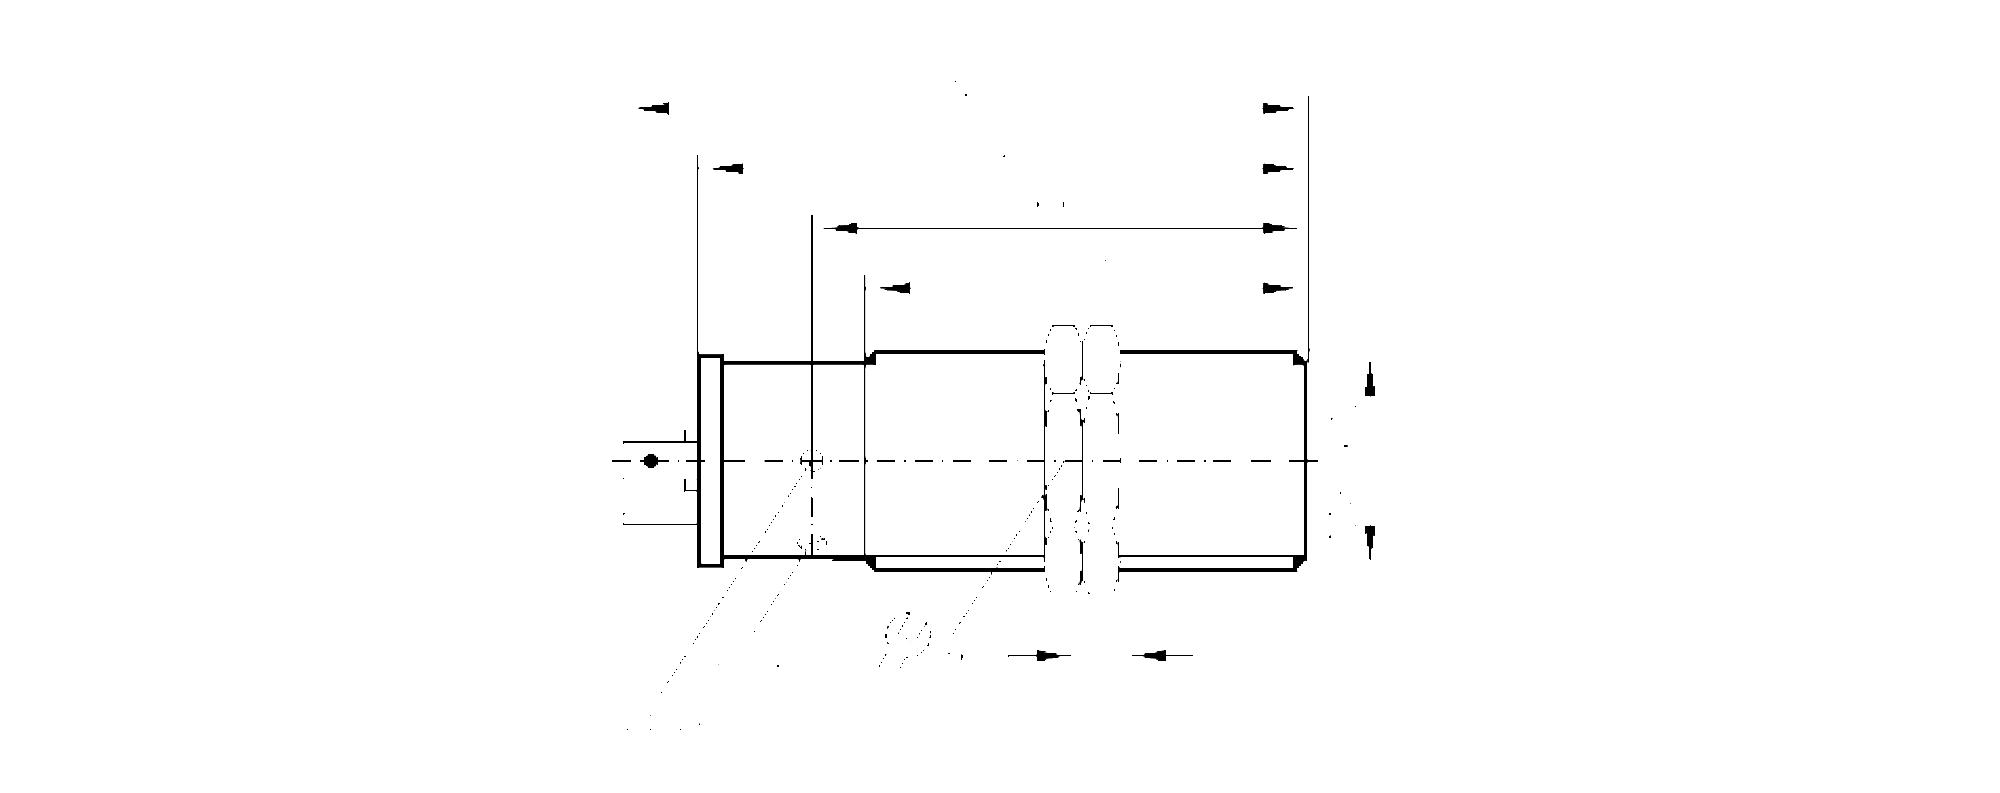 ki5038 - capacitive sensor